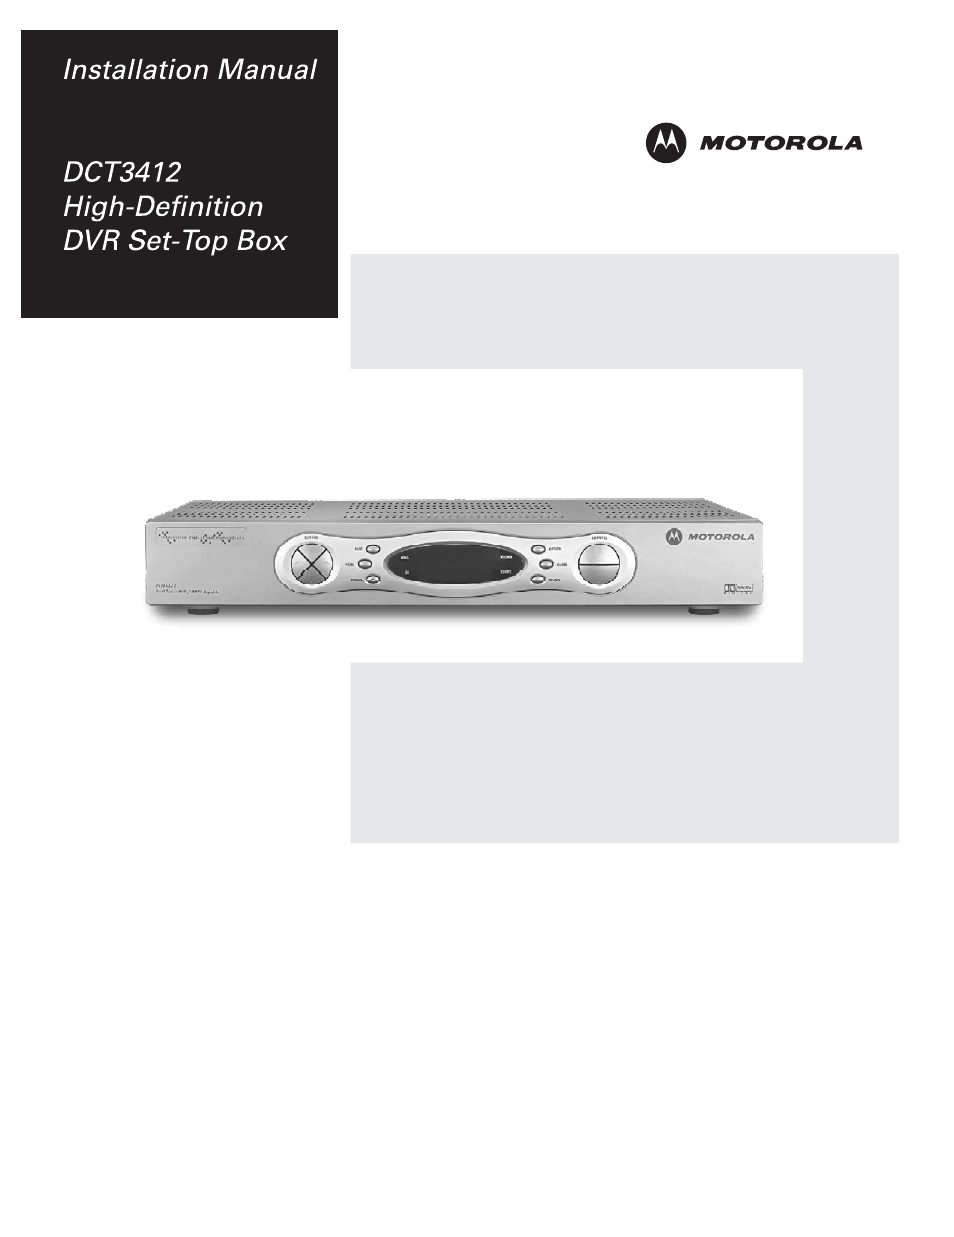 motorola dct3412 manual user guide manual that easy to read u2022 rh sibere co